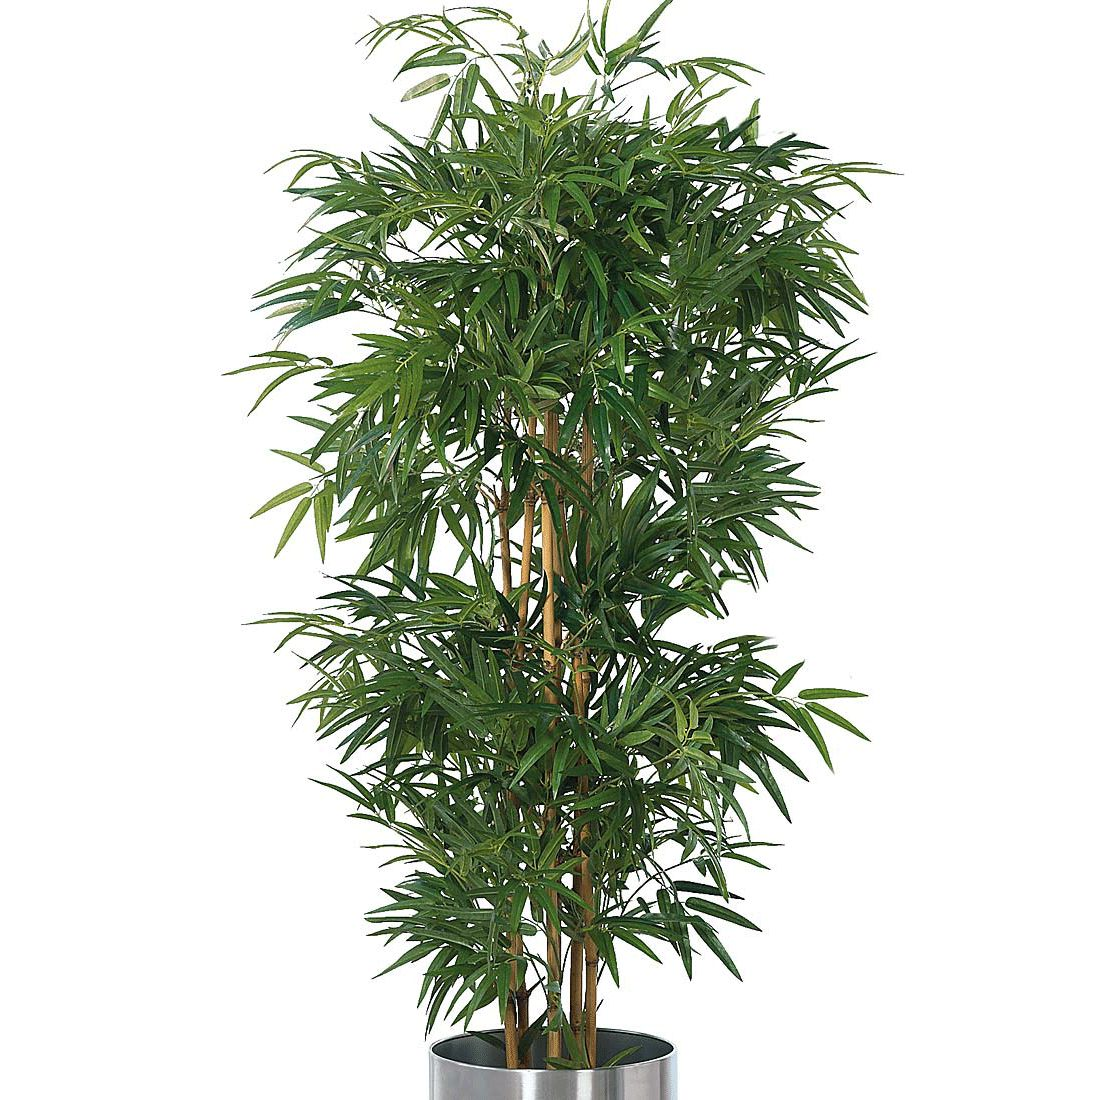 Kunstpflanze Bambusbaum – Textilgewebe – Grün, PureDay jetzt bestellen